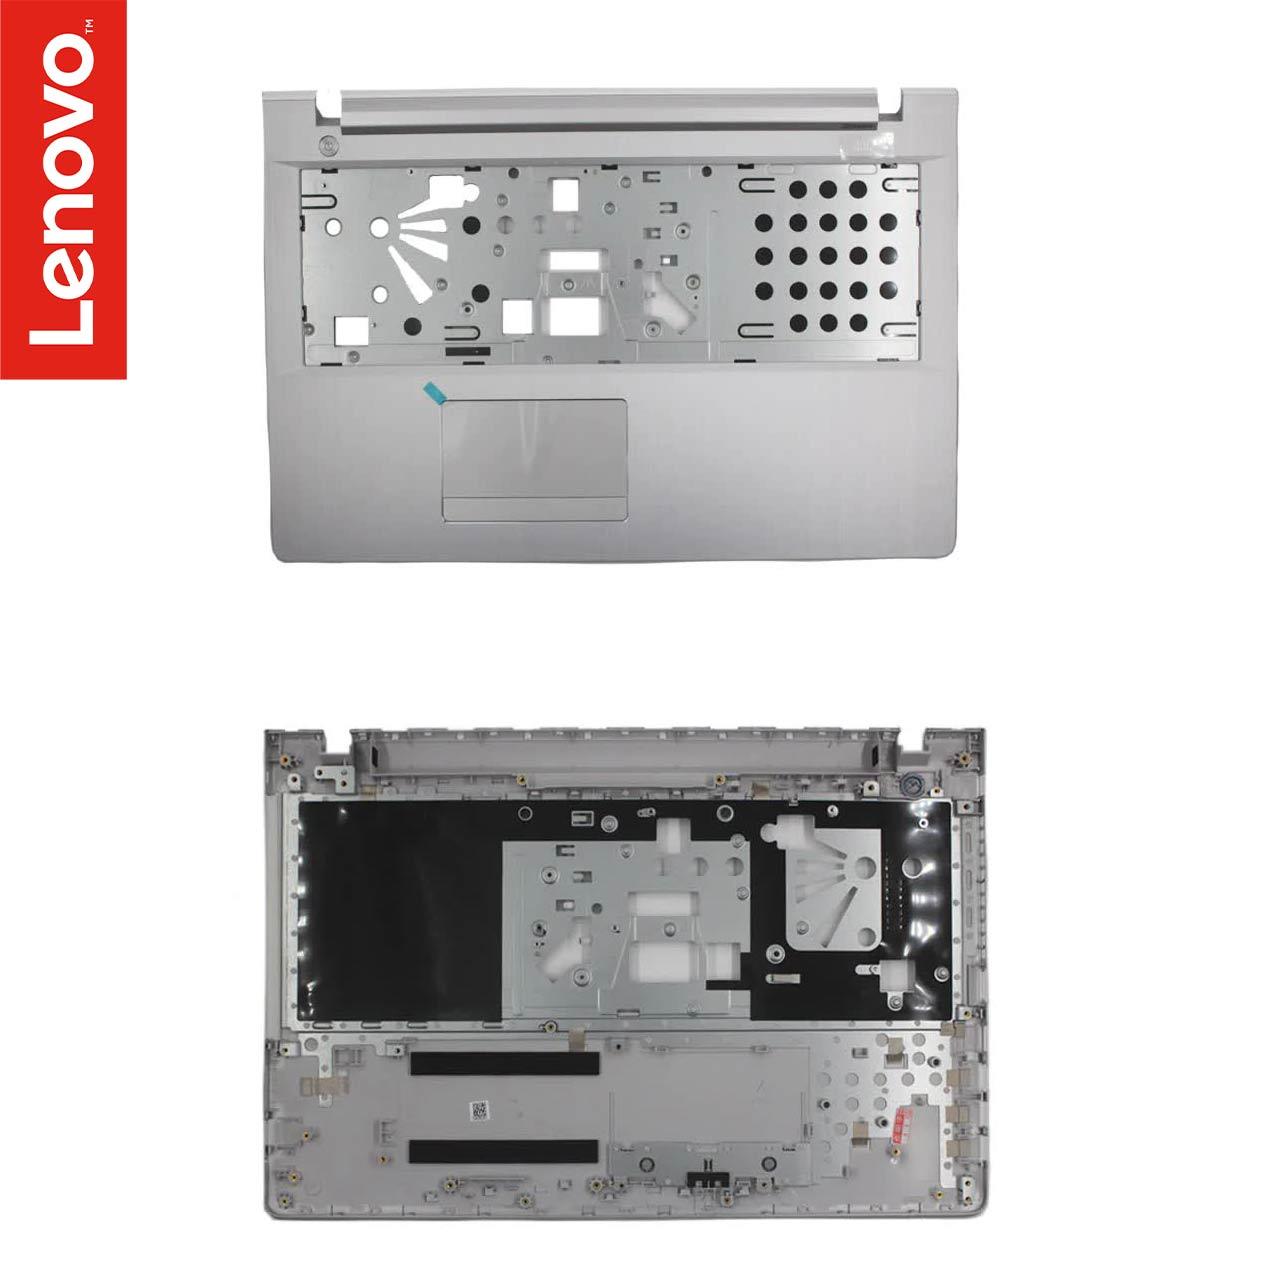 قاب کامل لپ تاپ لنوو Ideapad ip500